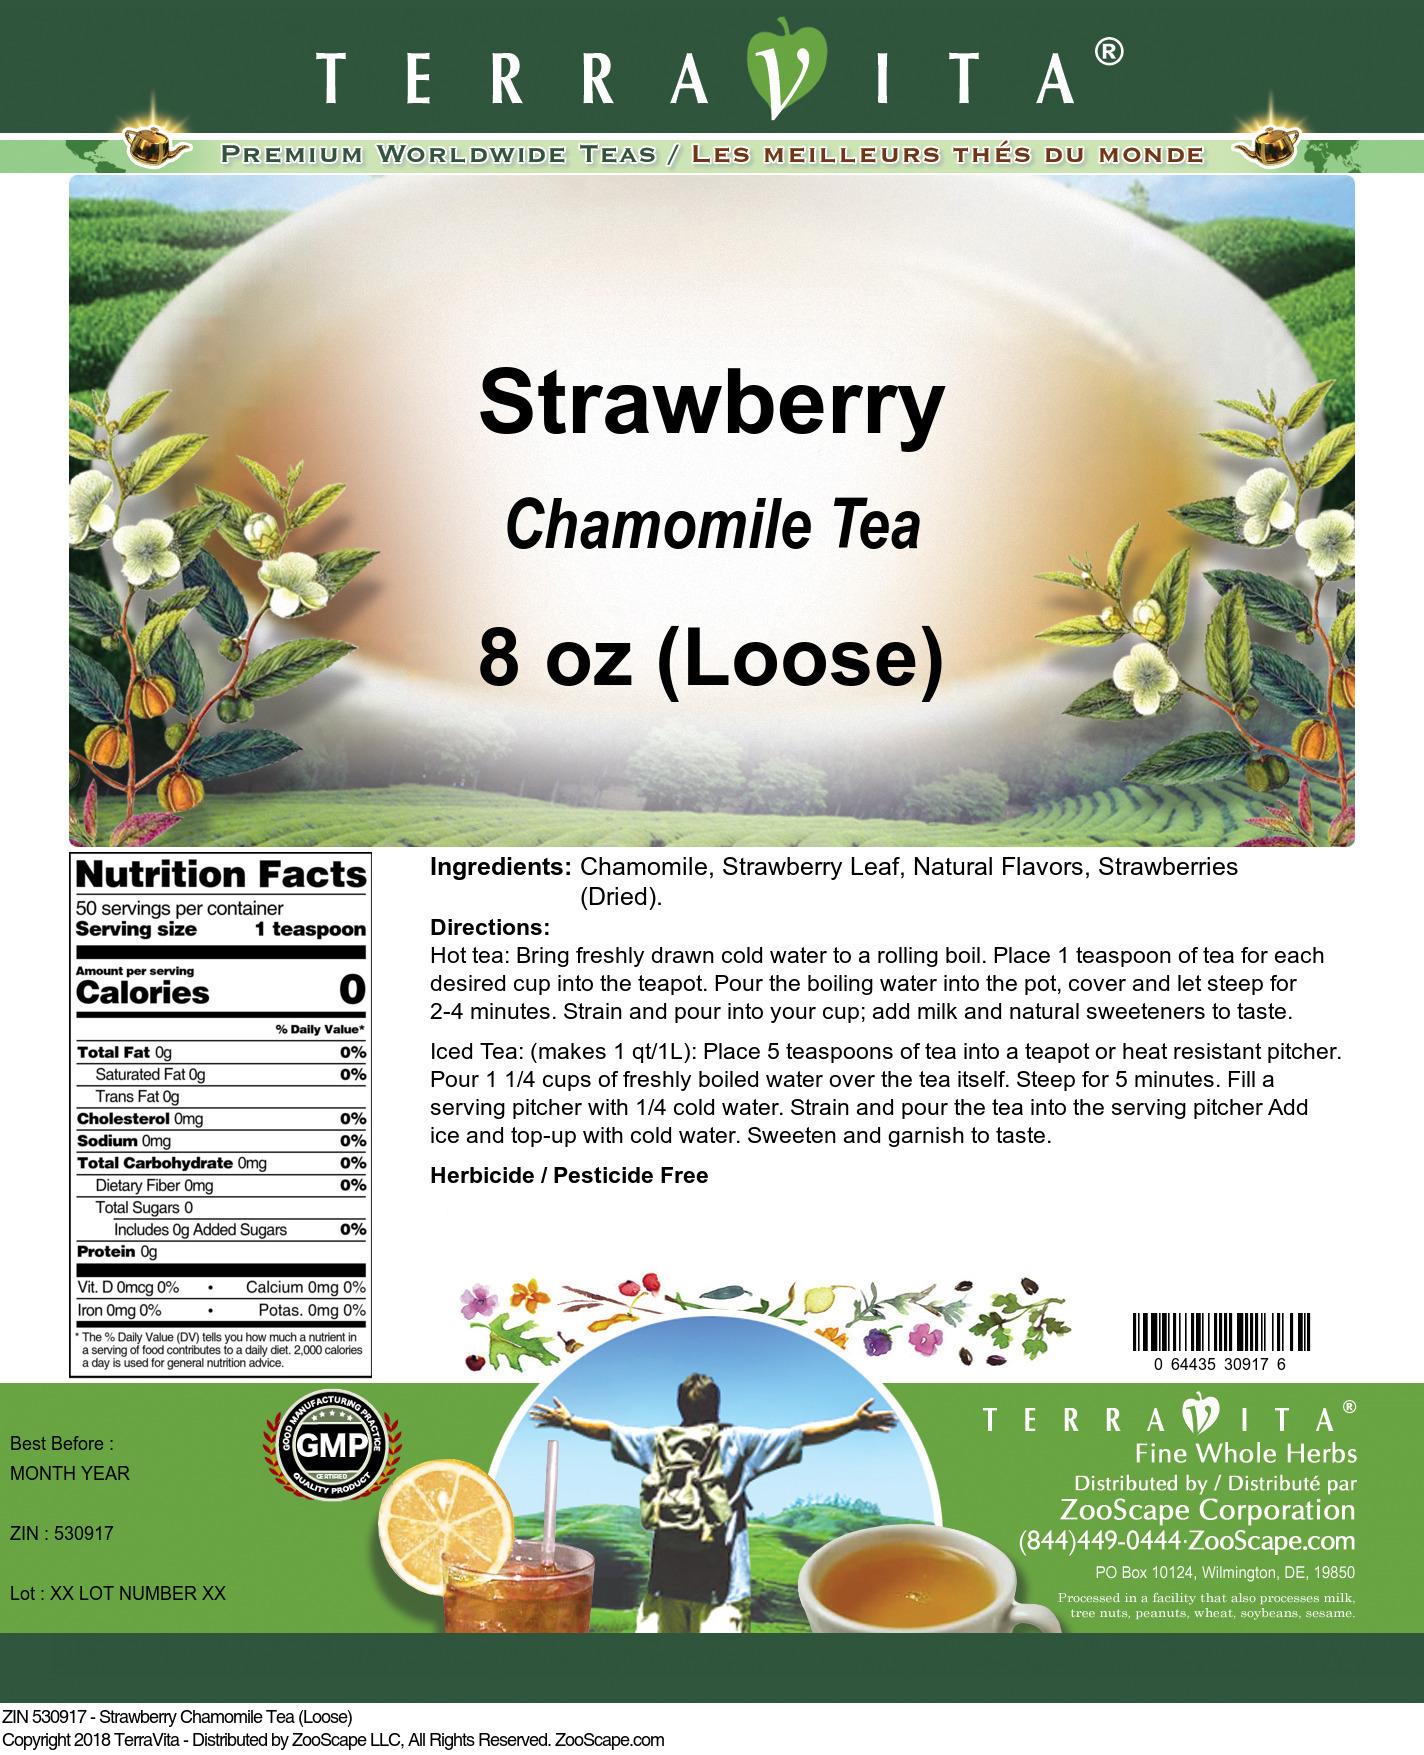 Strawberry Chamomile Tea (Loose)